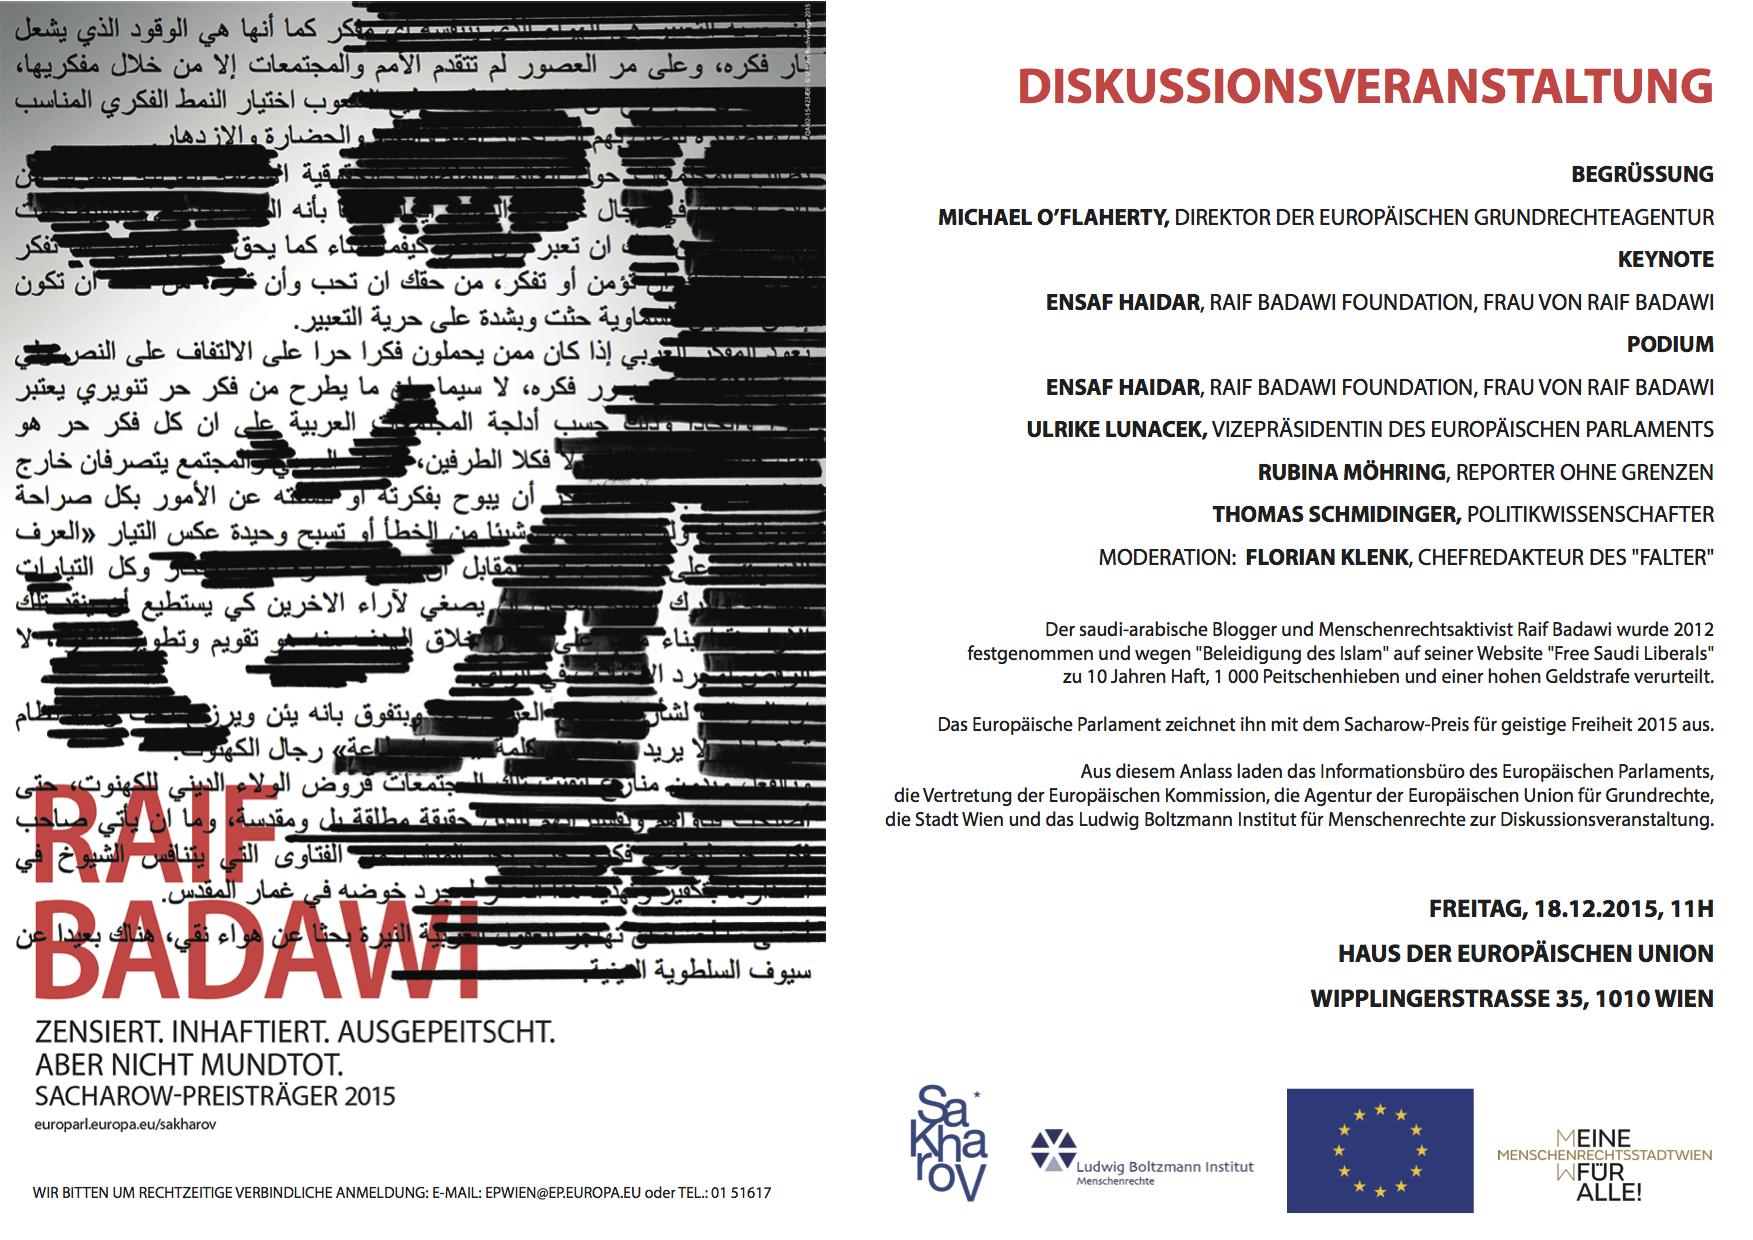 EinladungBadawi8